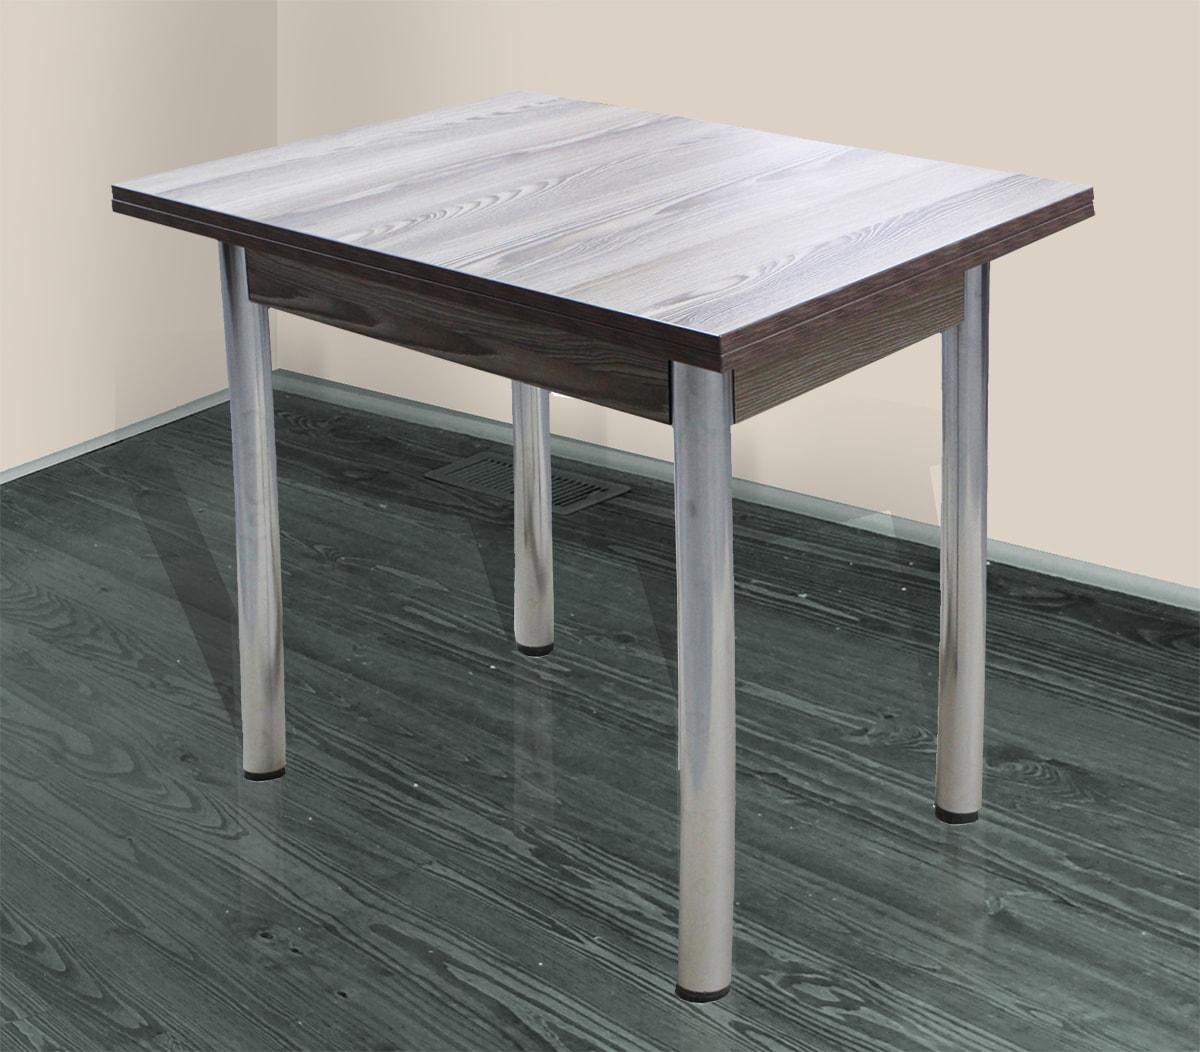 Металлические ножки для стола своими руками фото